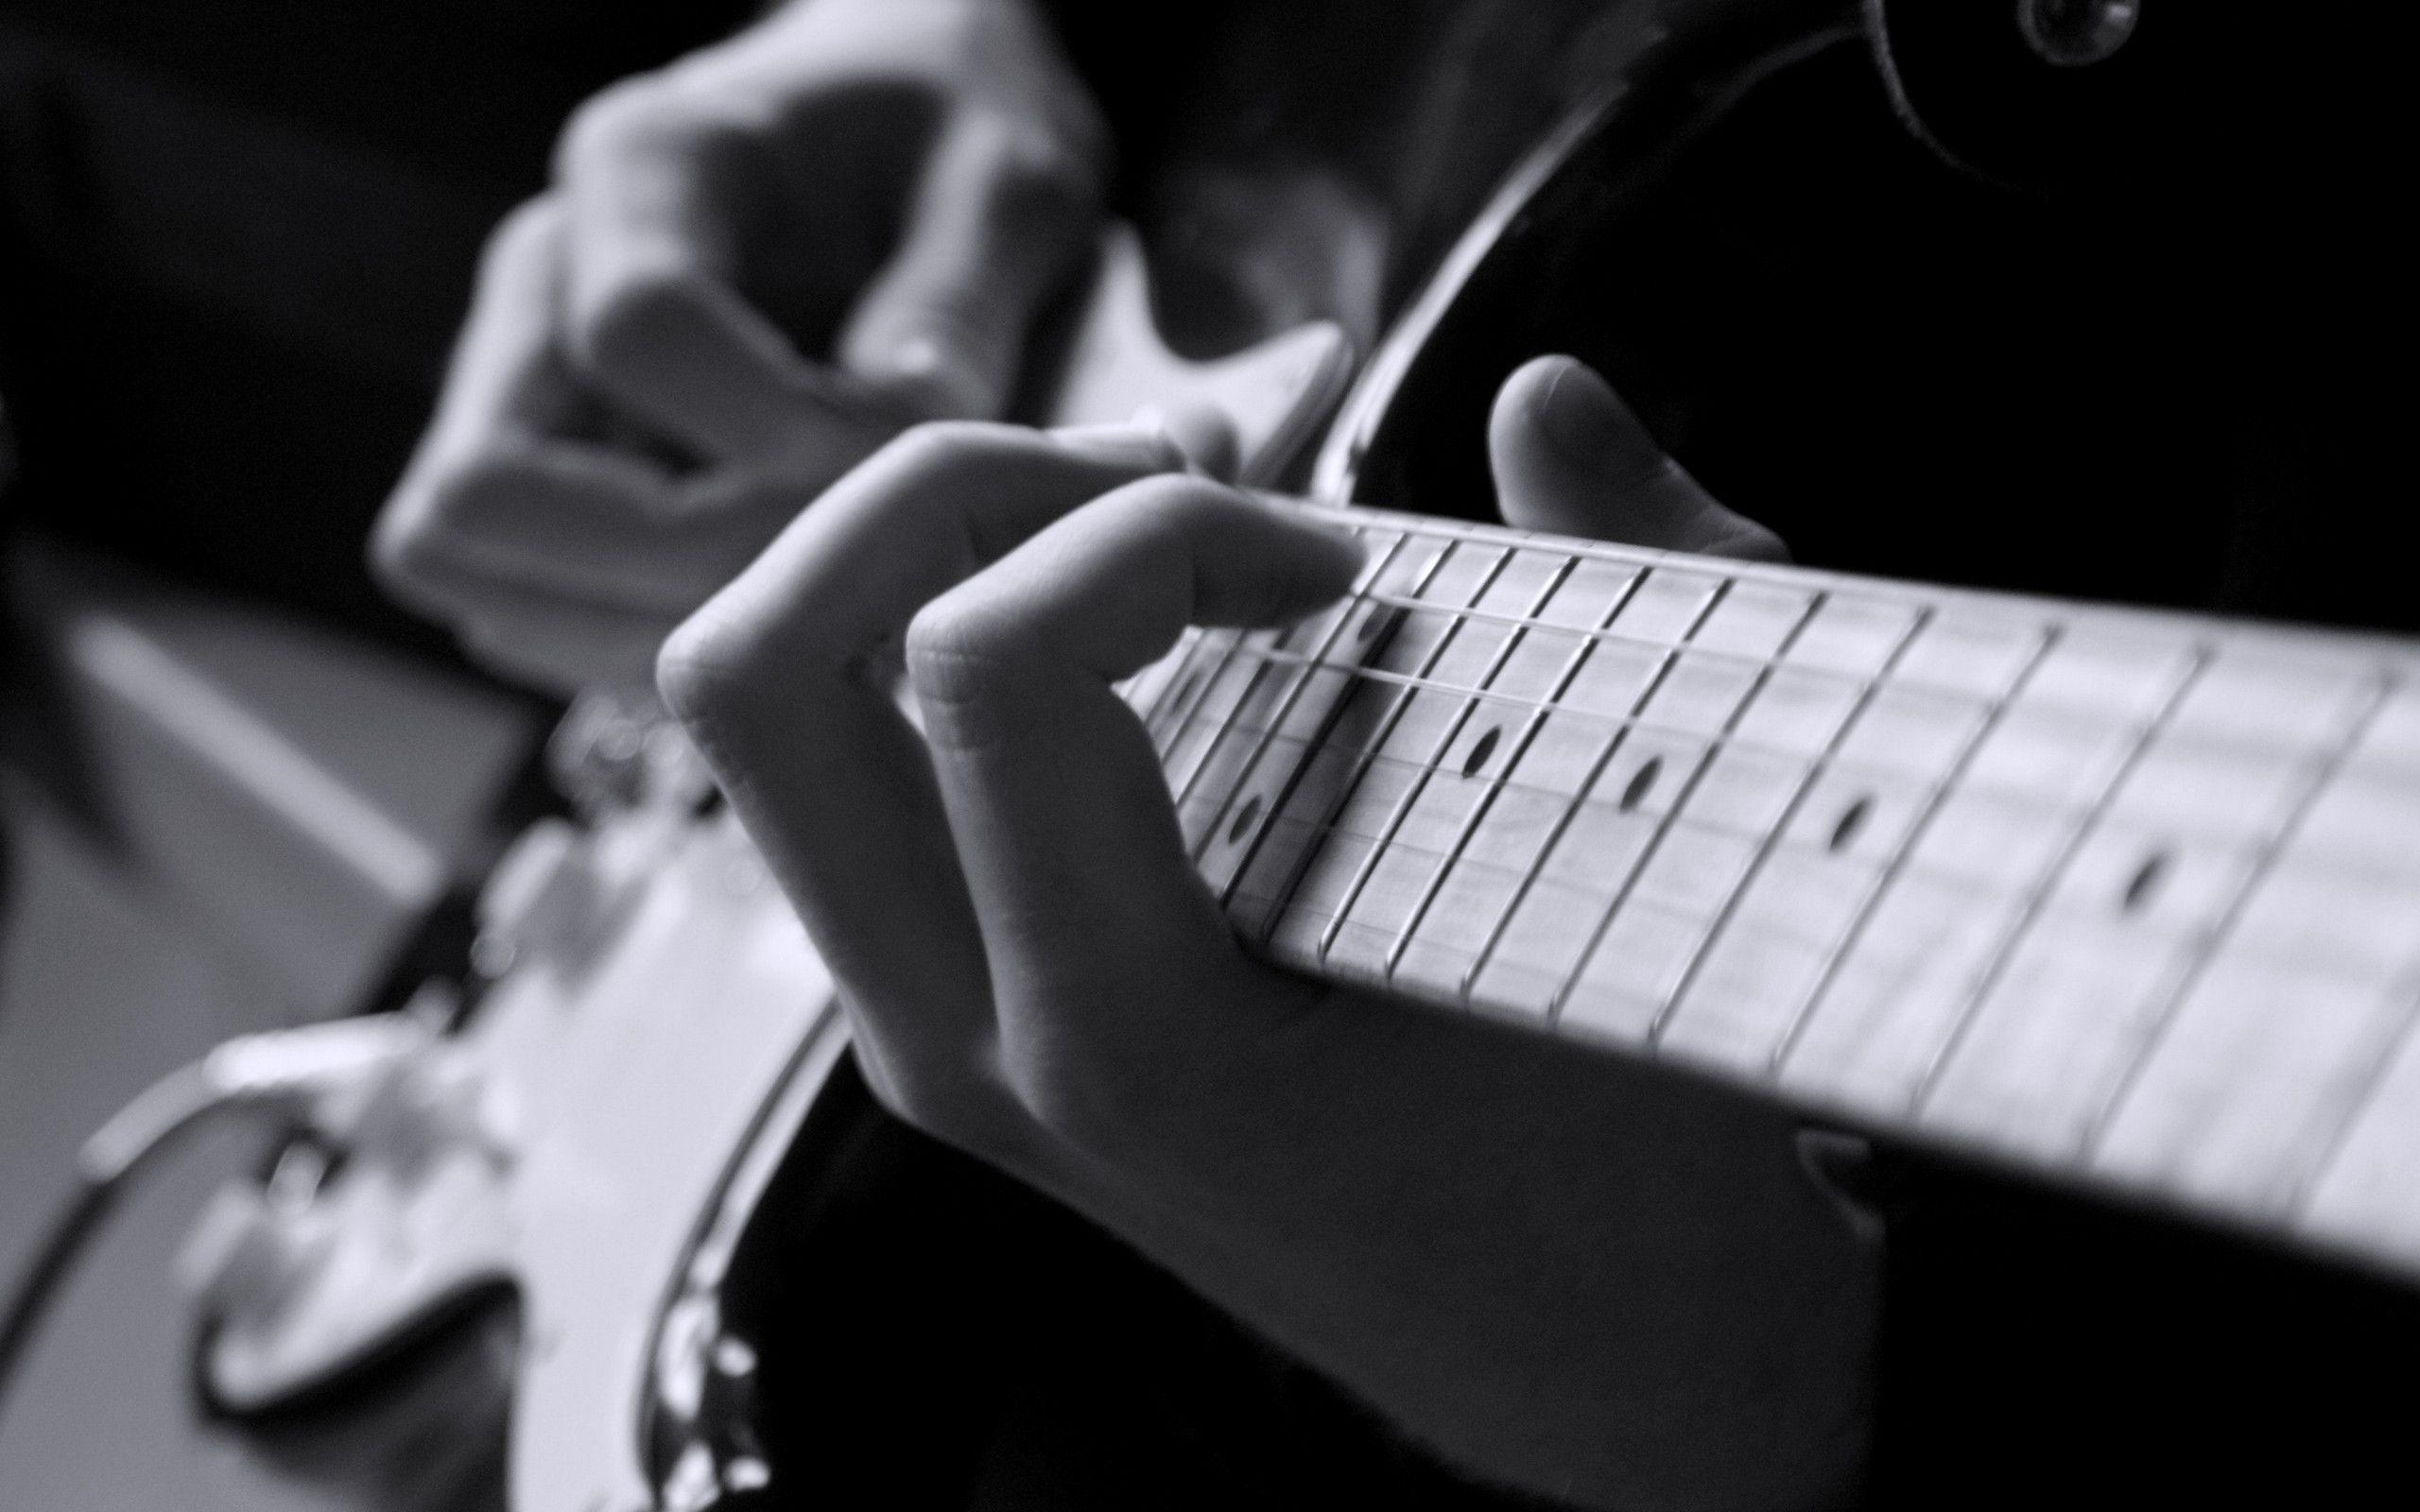 Guitar Wallpapers HD | Free HD Desktop Wallpaper | Viewhdwall.